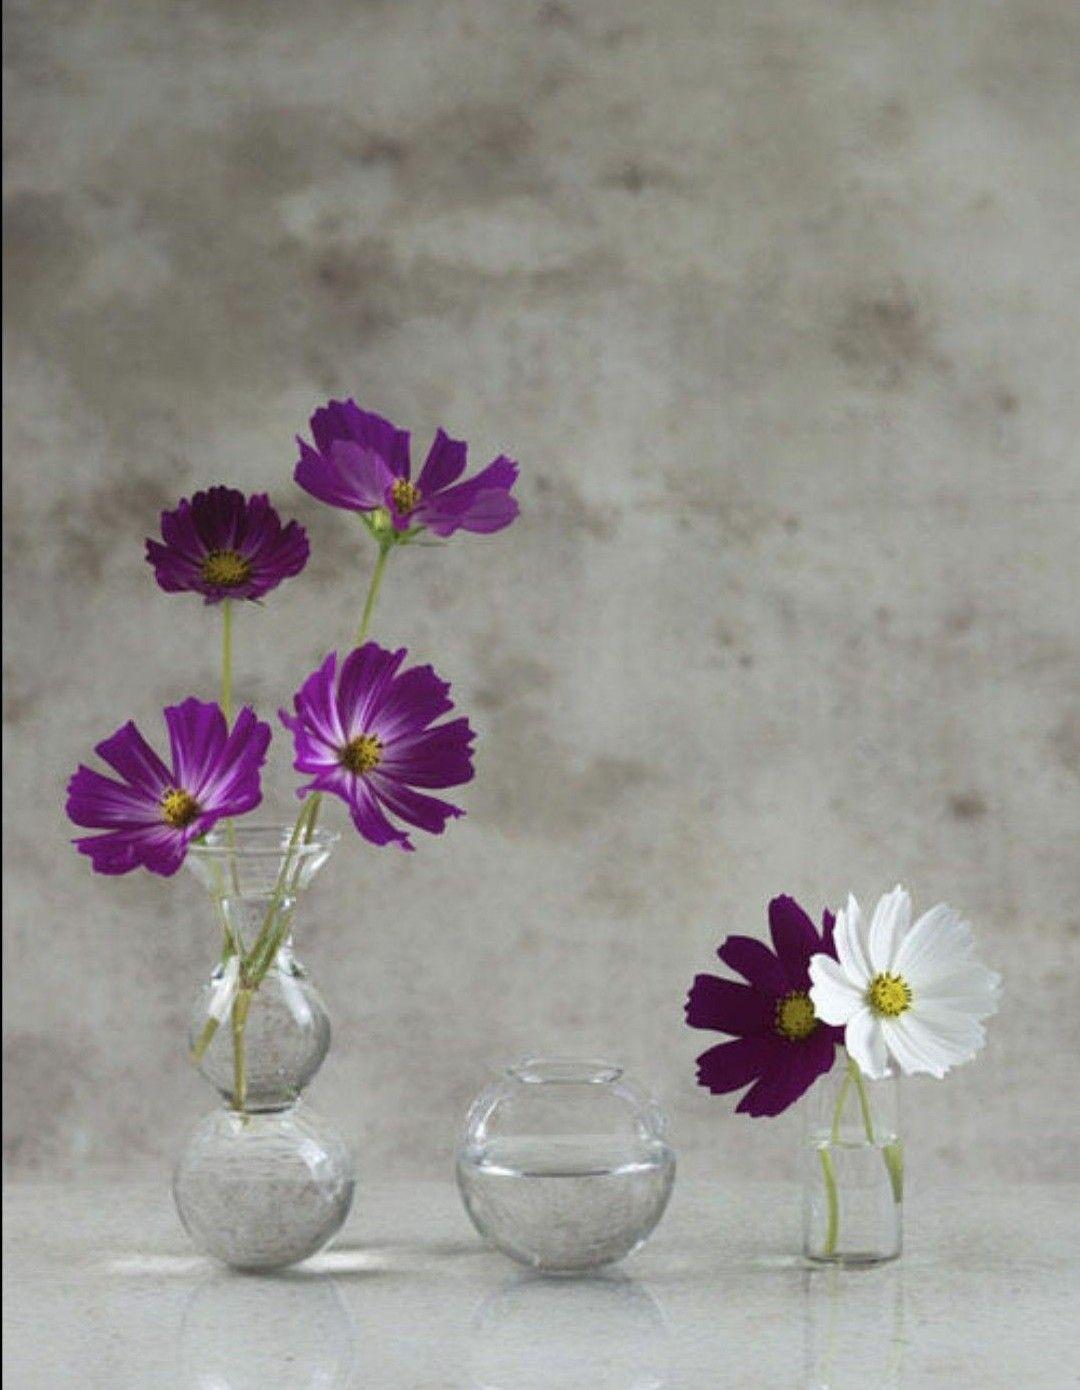 Pin By Estela Borke On Still Life Violet Flower Flowers Cosmos